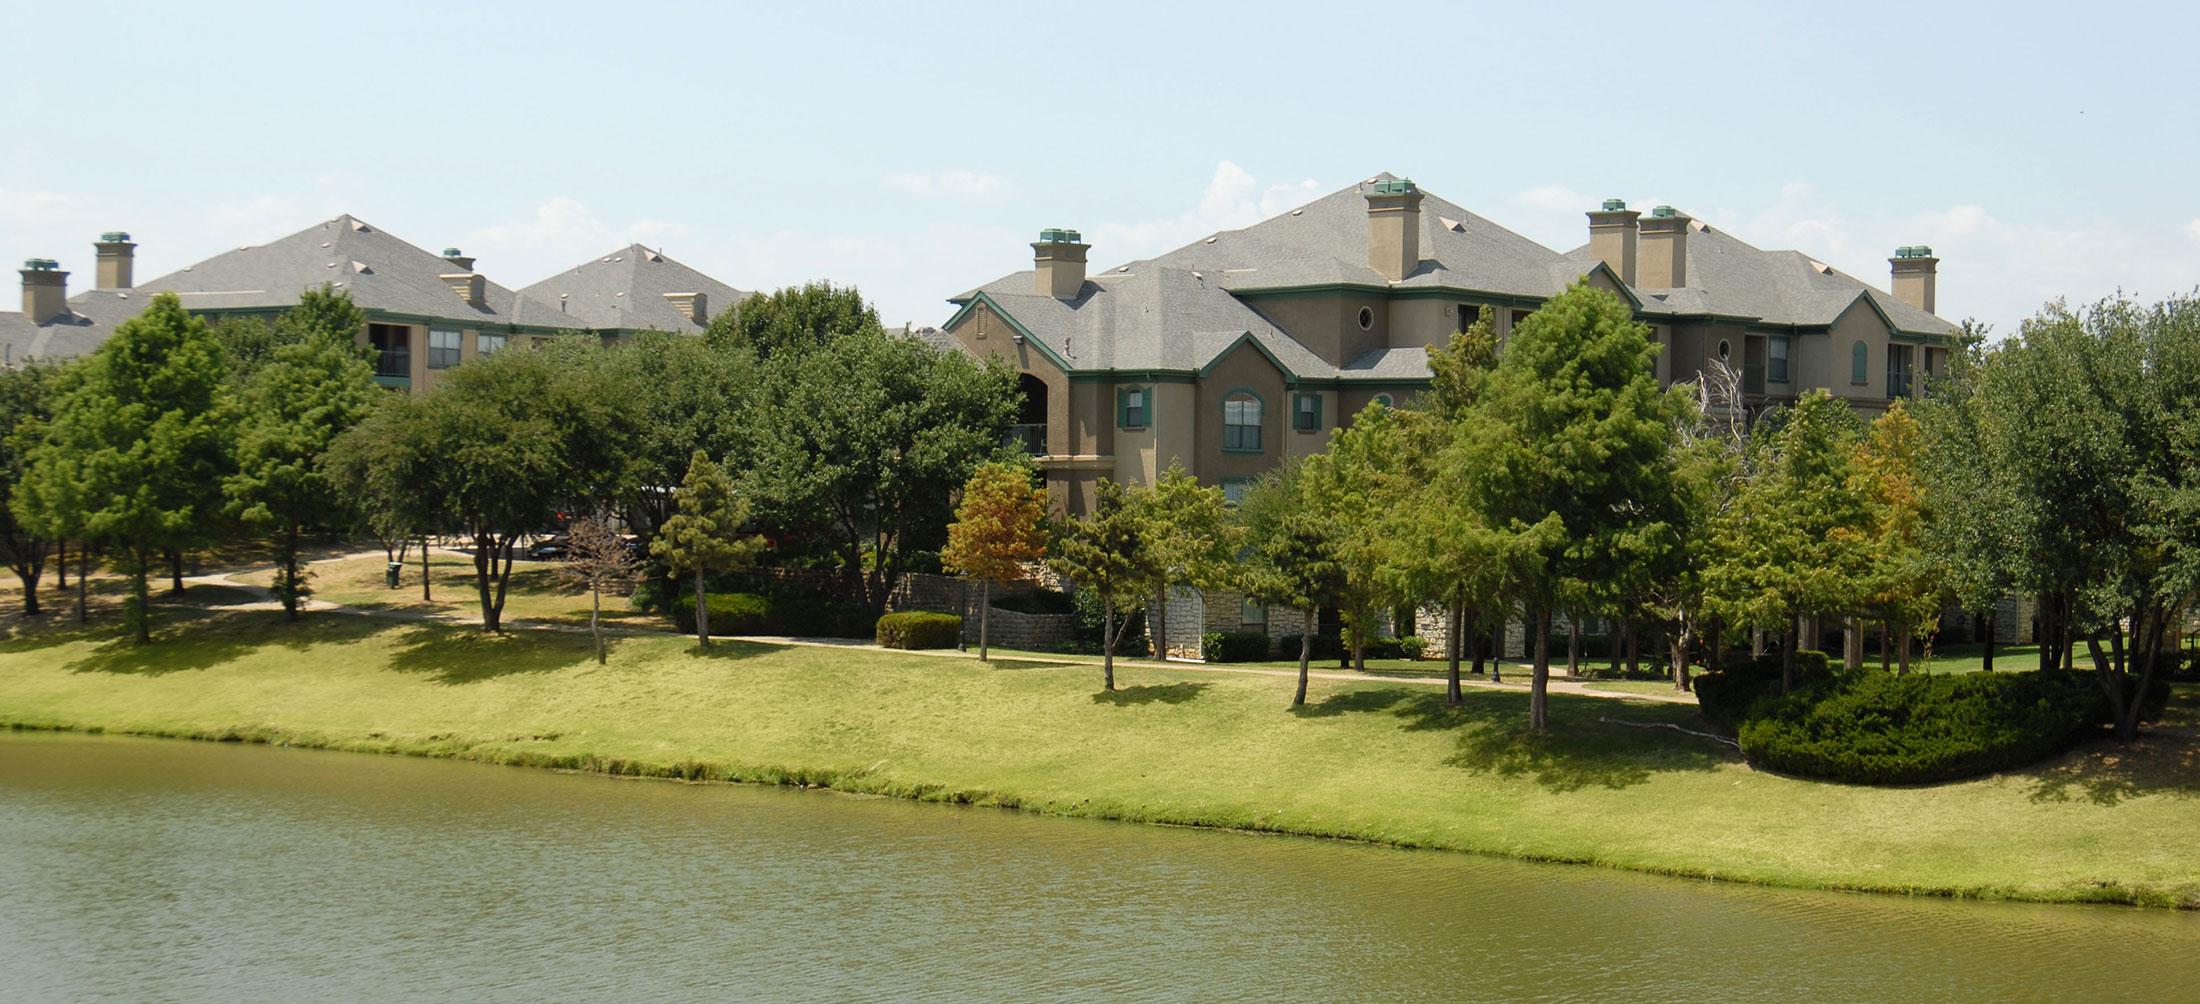 The Villas at Beaver Creek Apartments in Irving TX